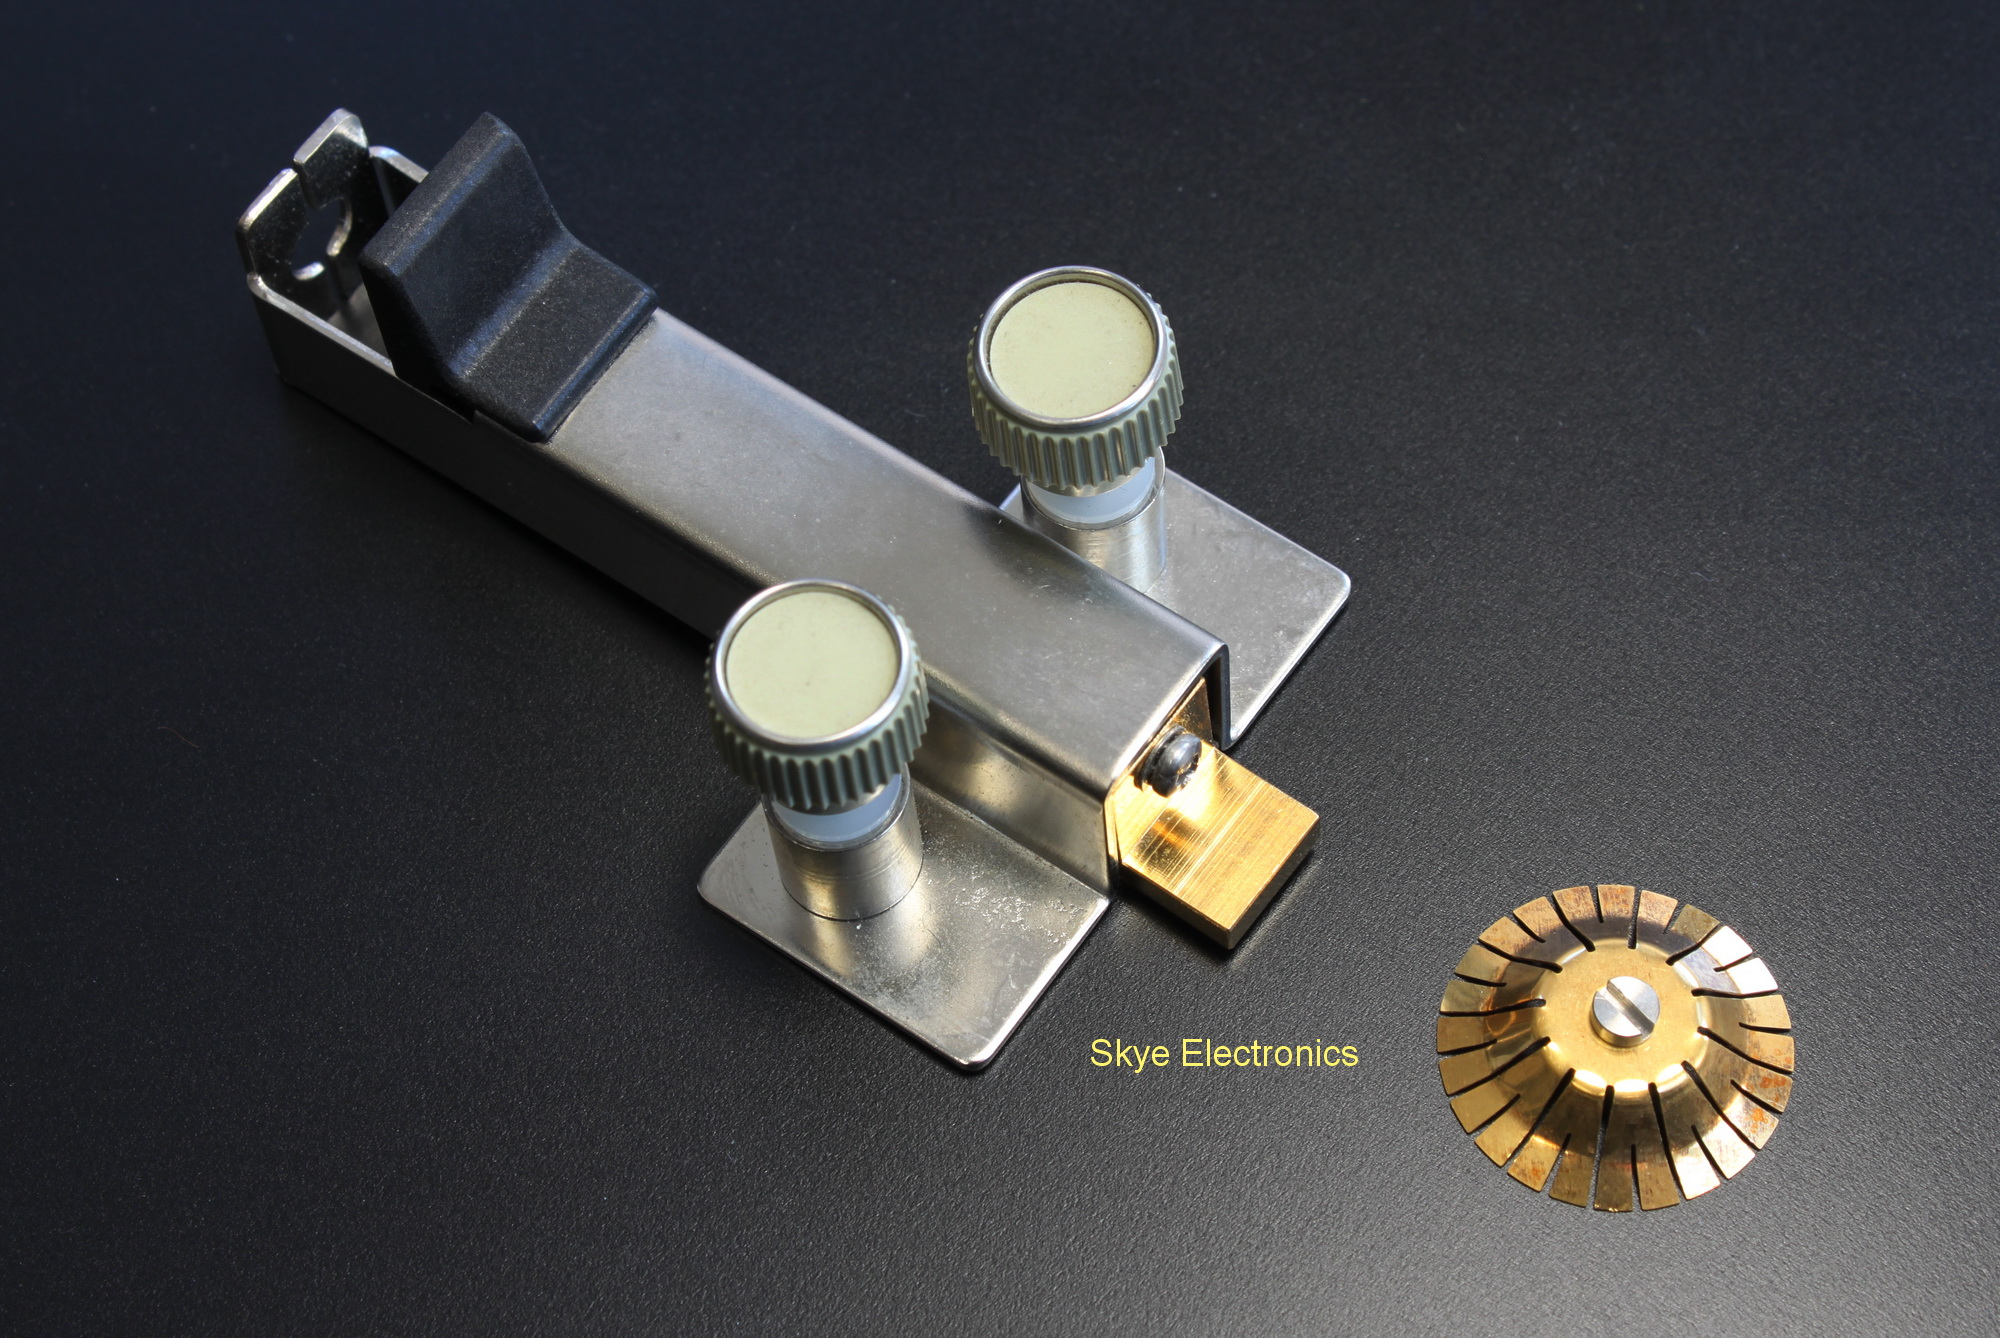 HP 16092A Skye Electronics